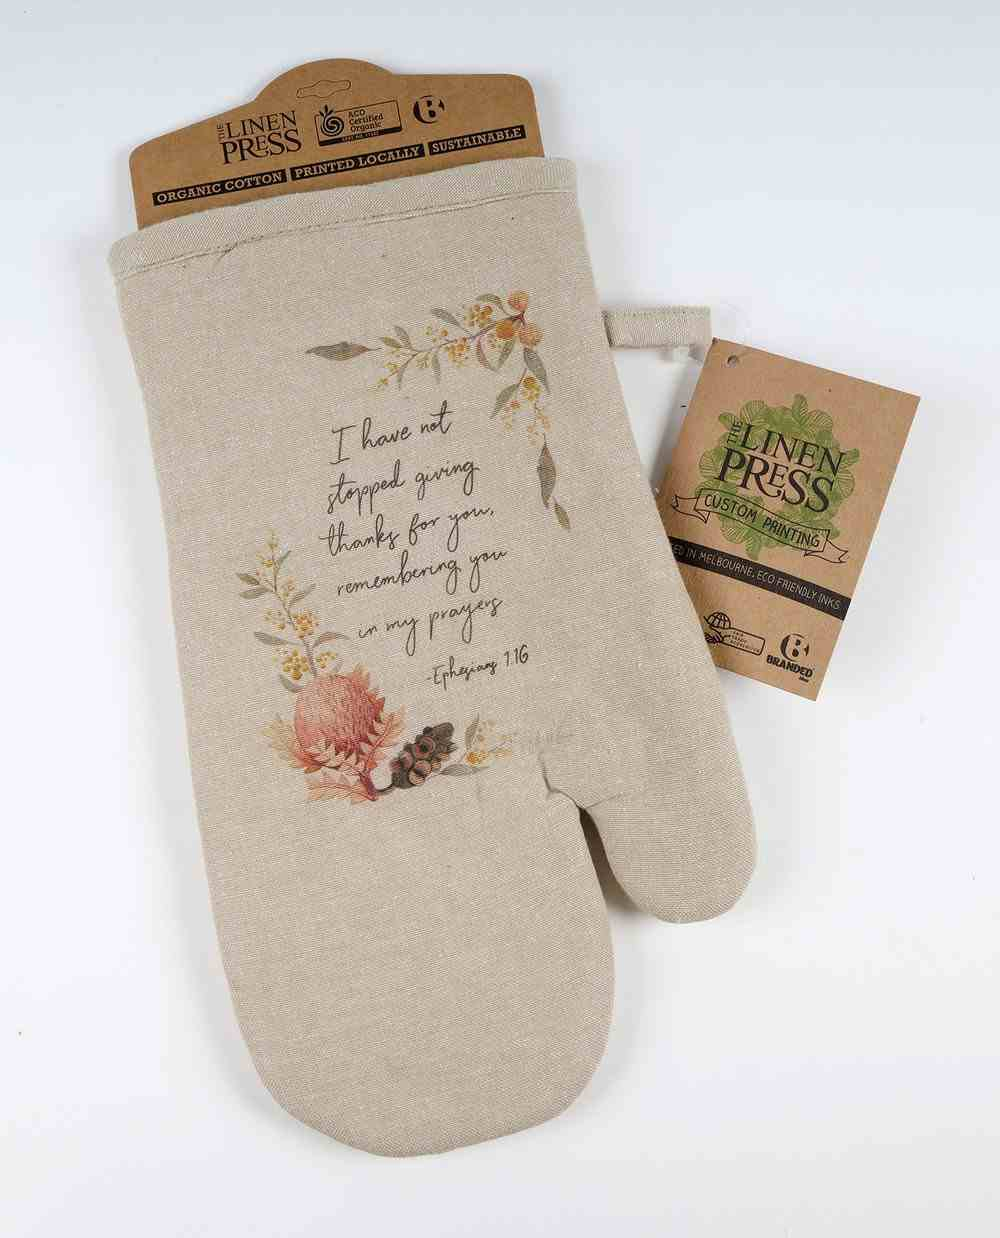 Oven Mitt Beige Fig Hill Farm Faith Giving Thanks (Eph 1: 16) (Australiana Products Series) Soft Goods